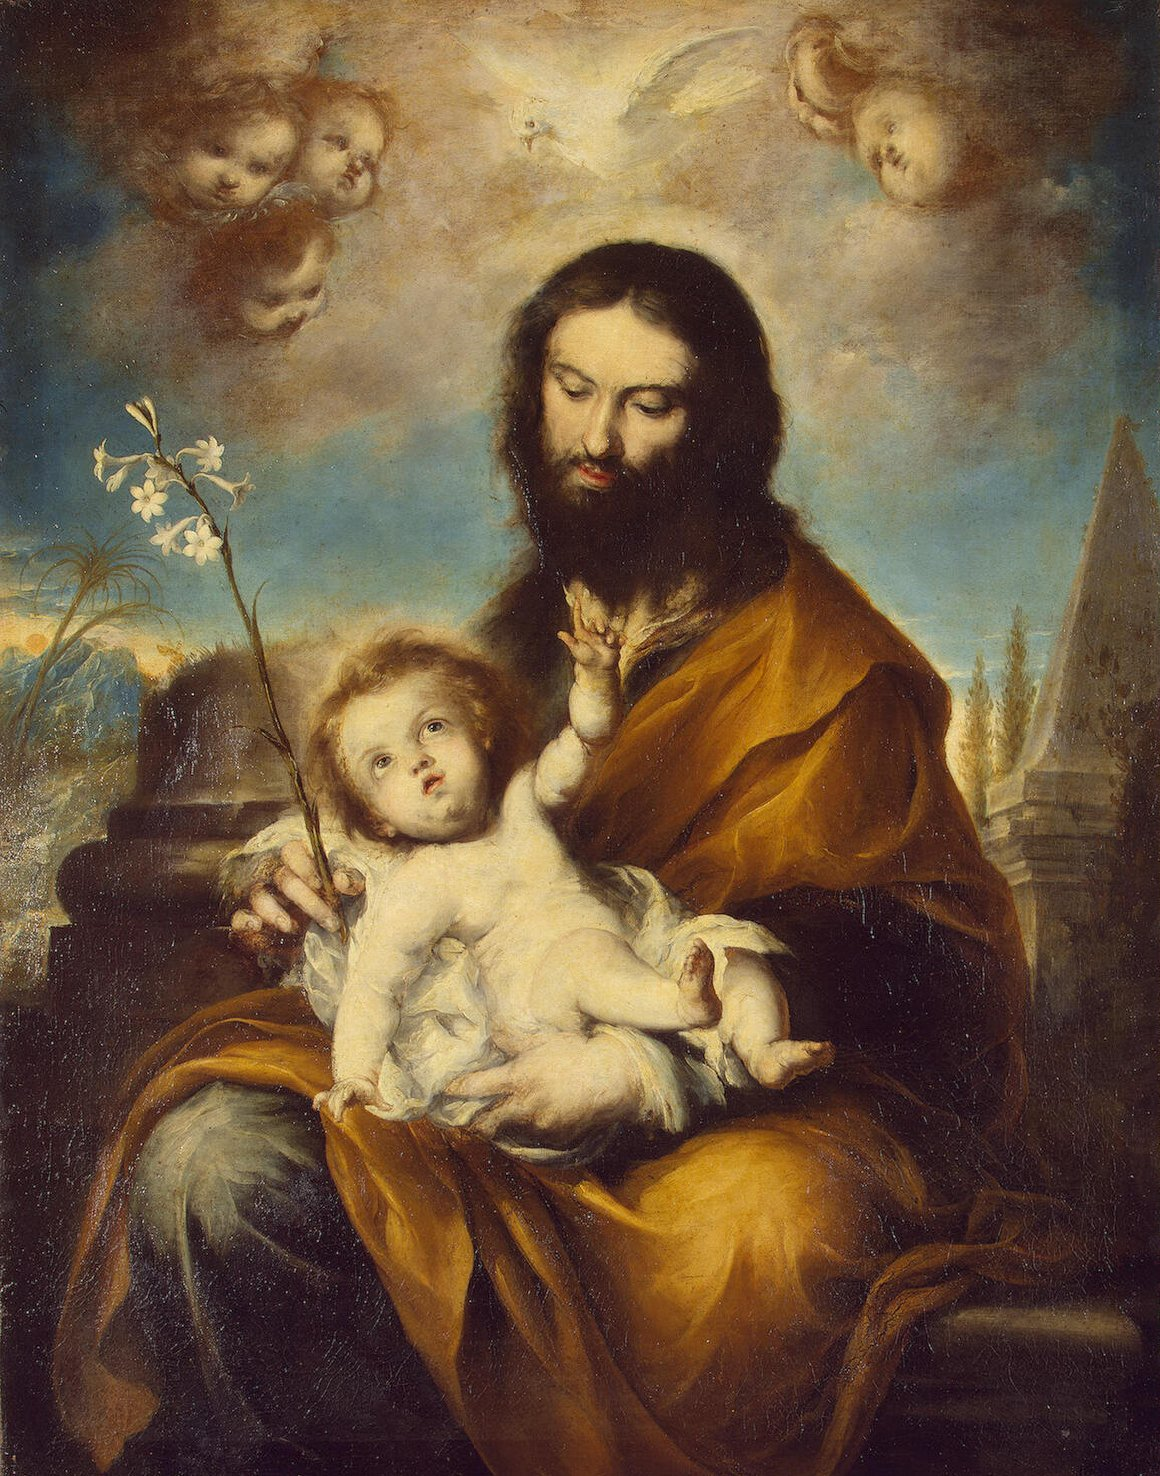 Proprium missae – Świętego Józefa Rzemieślnika – Sancti Joseph Opificis